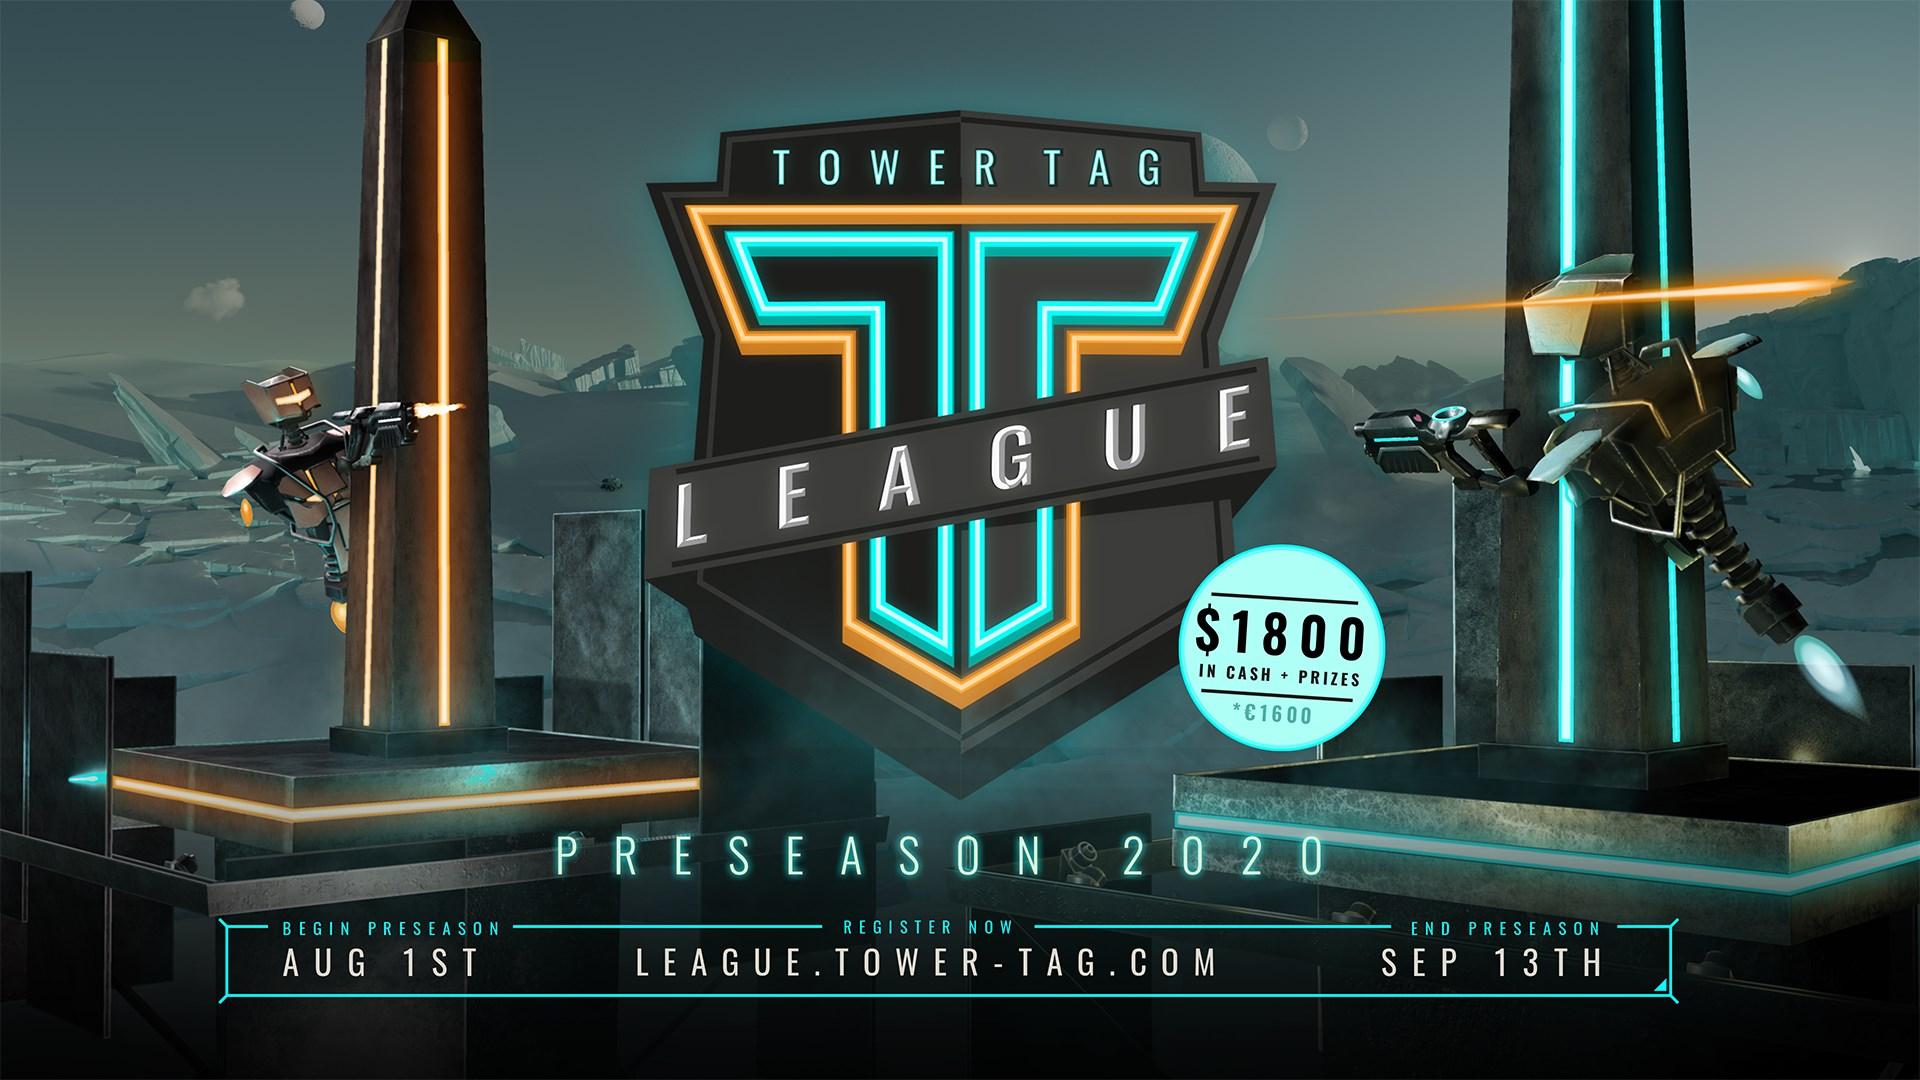 Tower Tag League Preseason